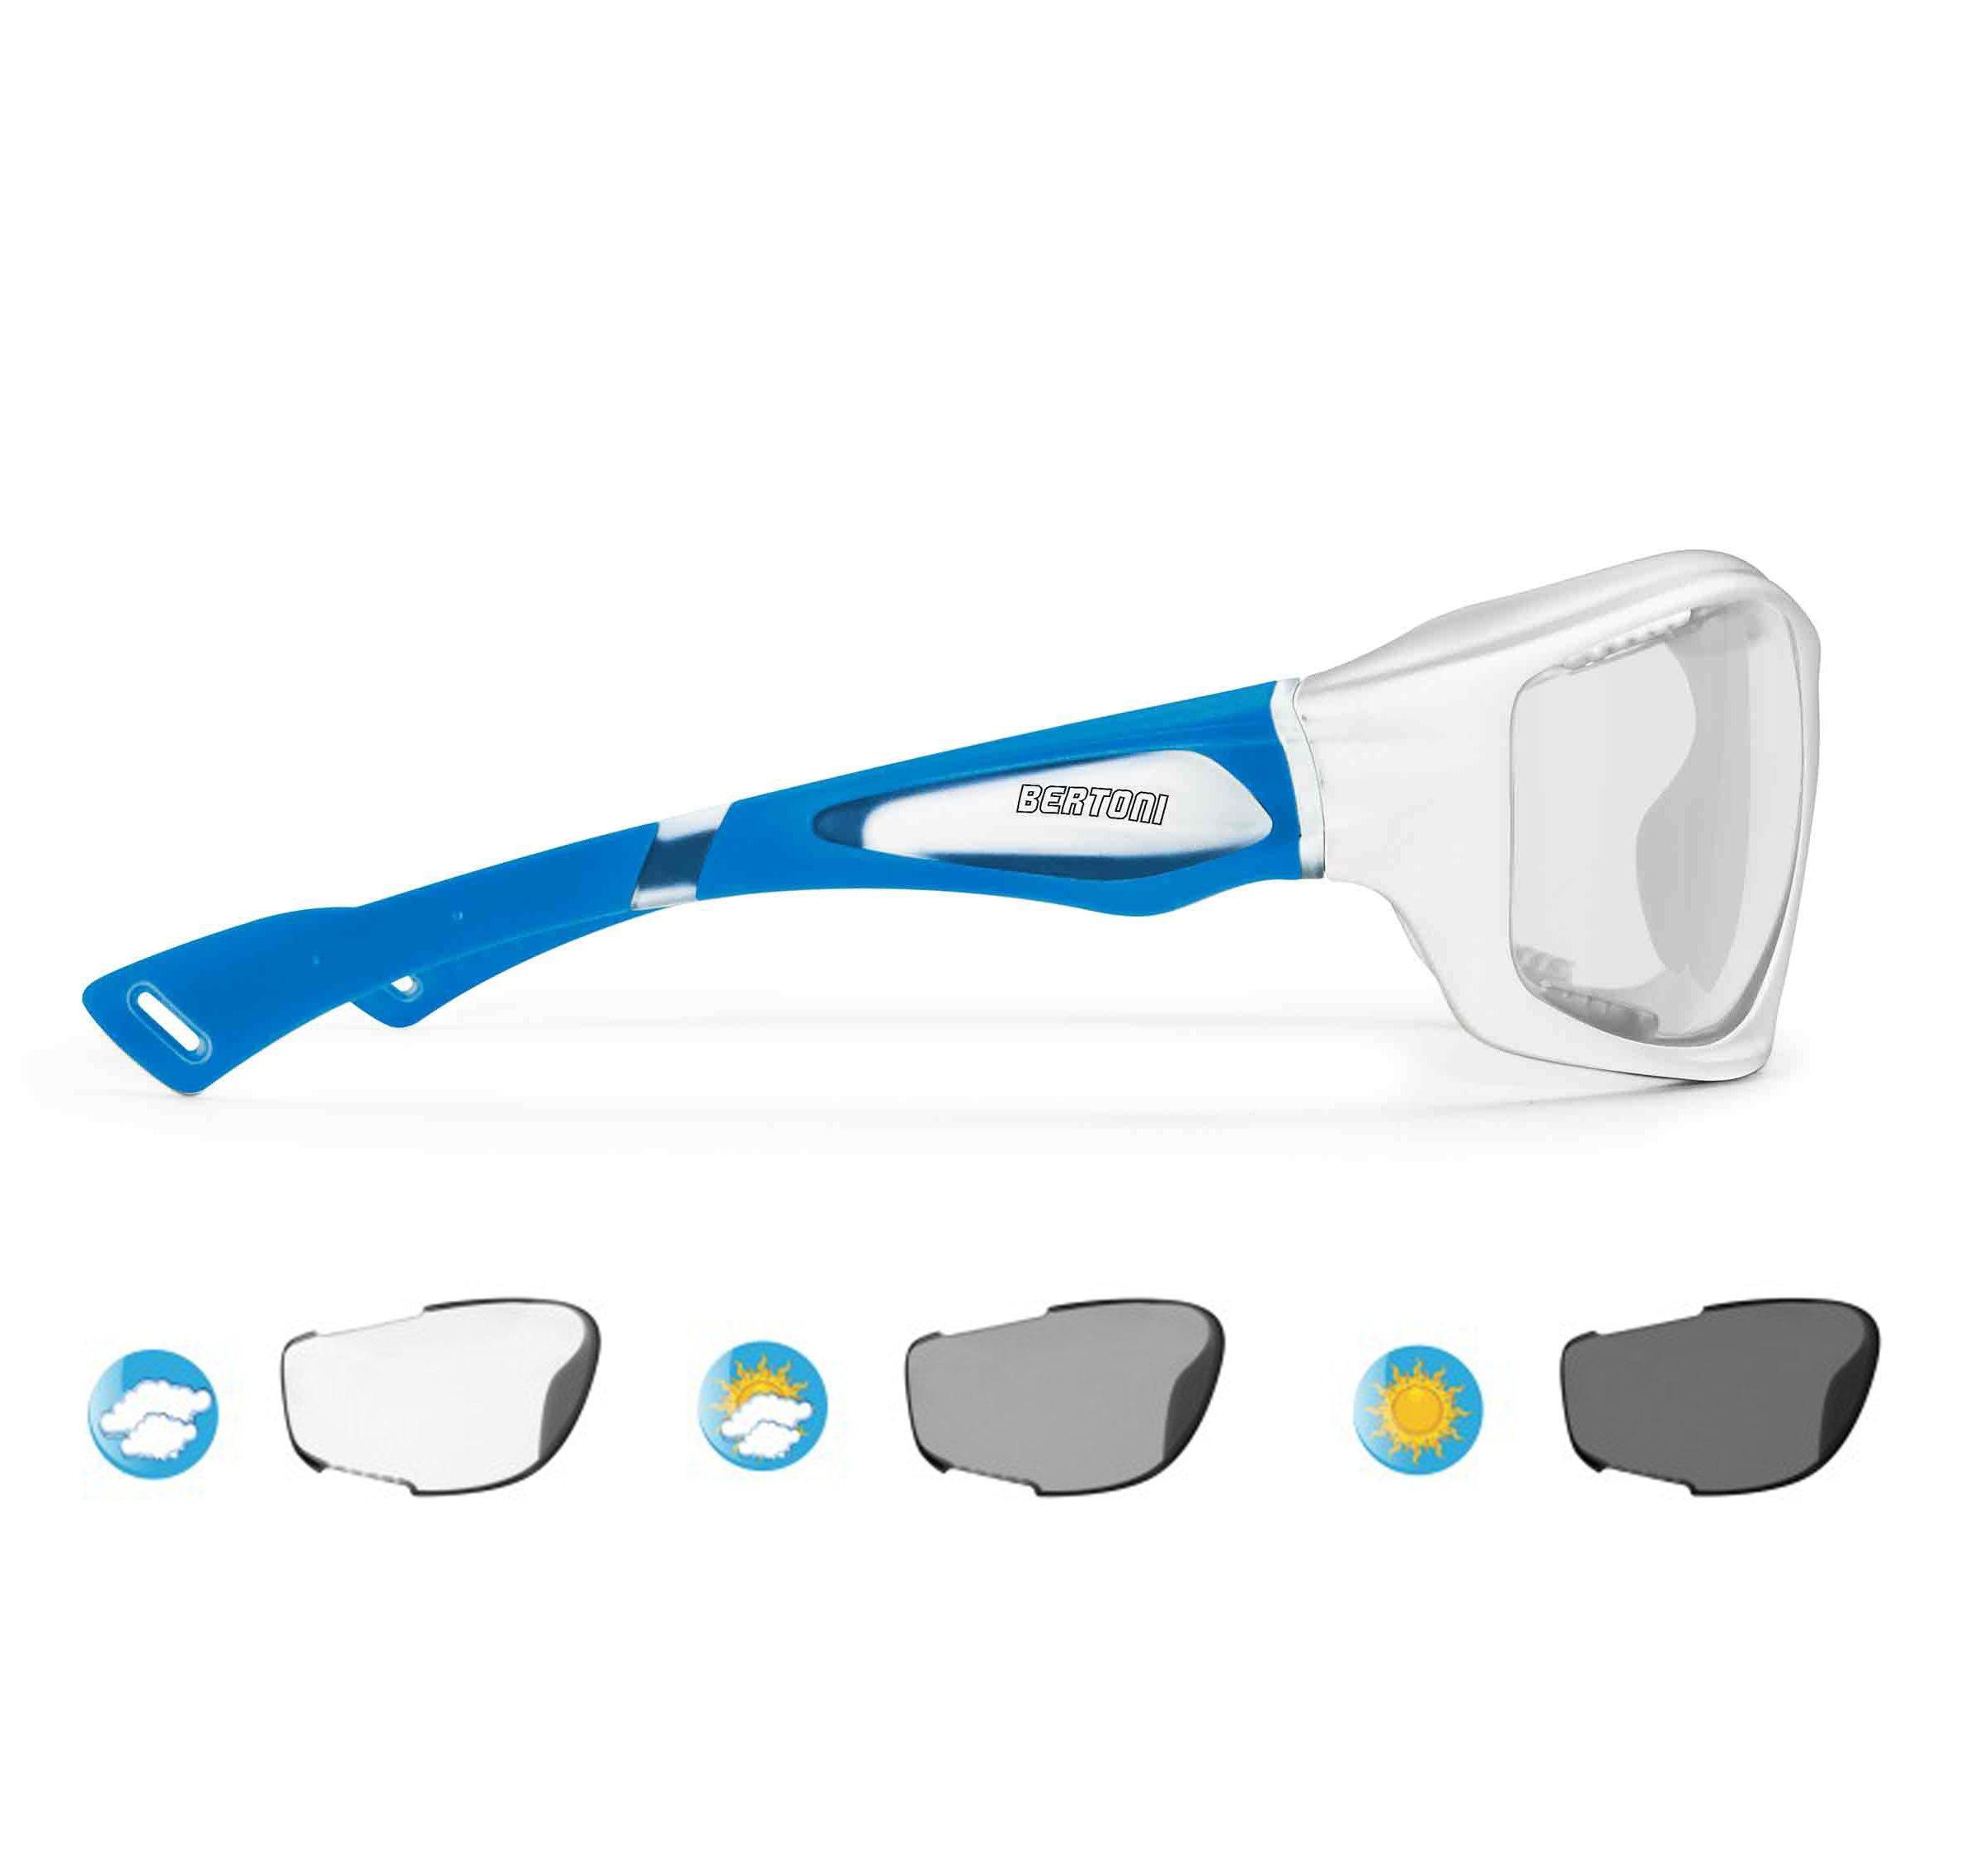 Bertoni Sport Sunglasses Photochromic cat. 0-3 Antifog for Cycling Running Golf Ski Watersports - F1000 Wraparound Windproof Glasses (Shiny White/Mat Blue, Photochromic Antifog)